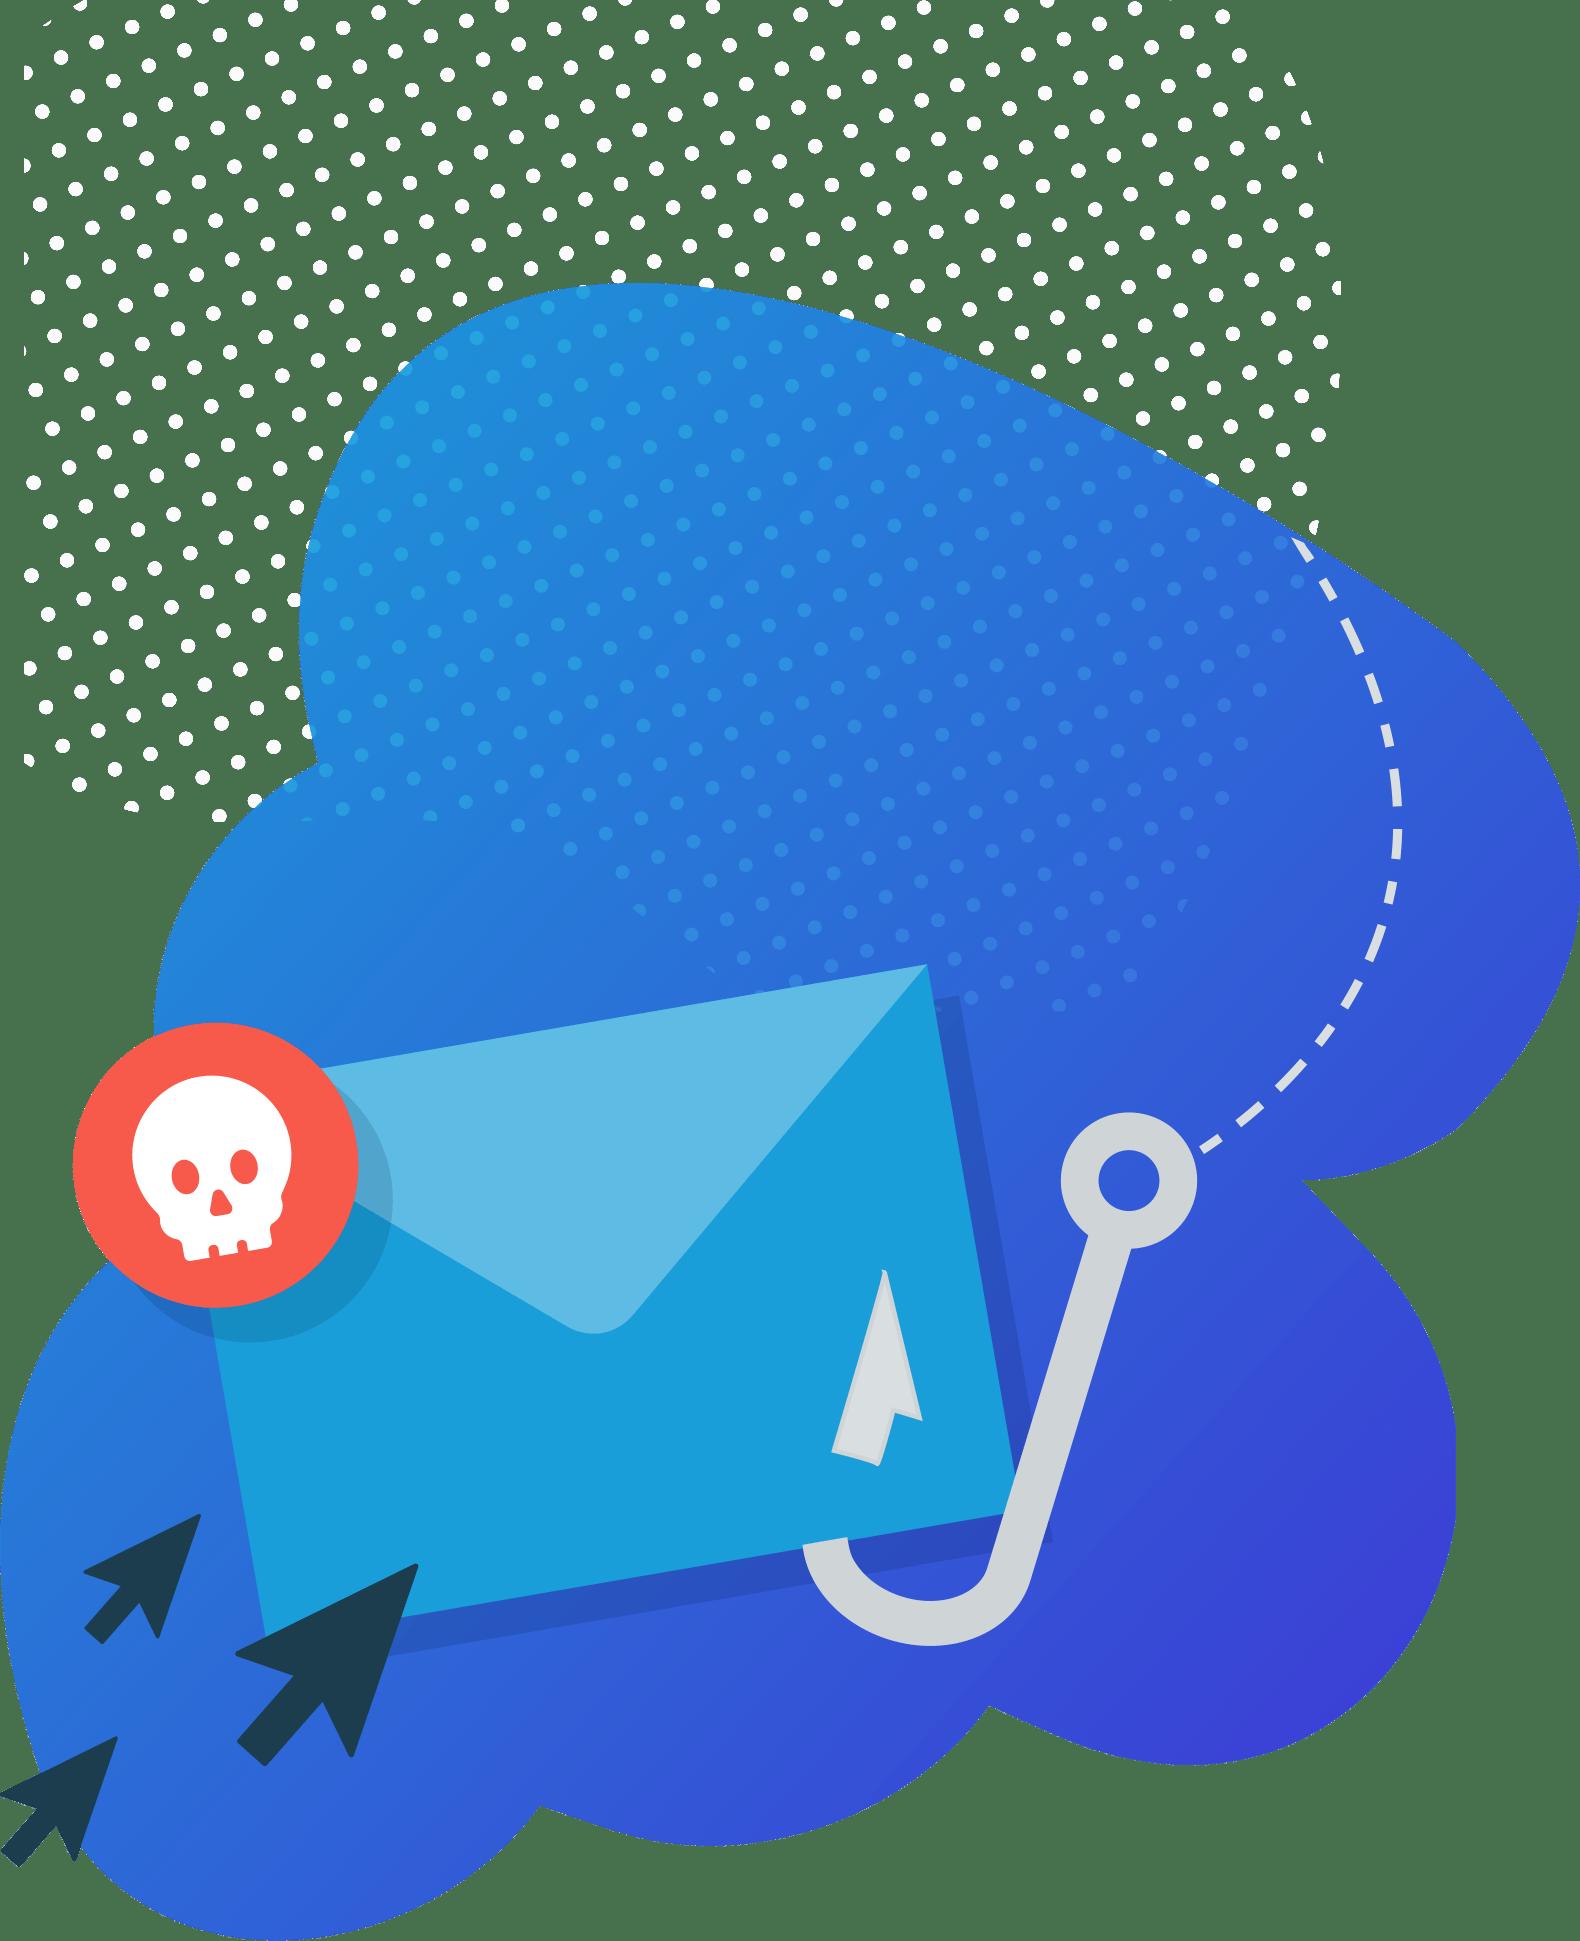 NA Common Types of Phishing